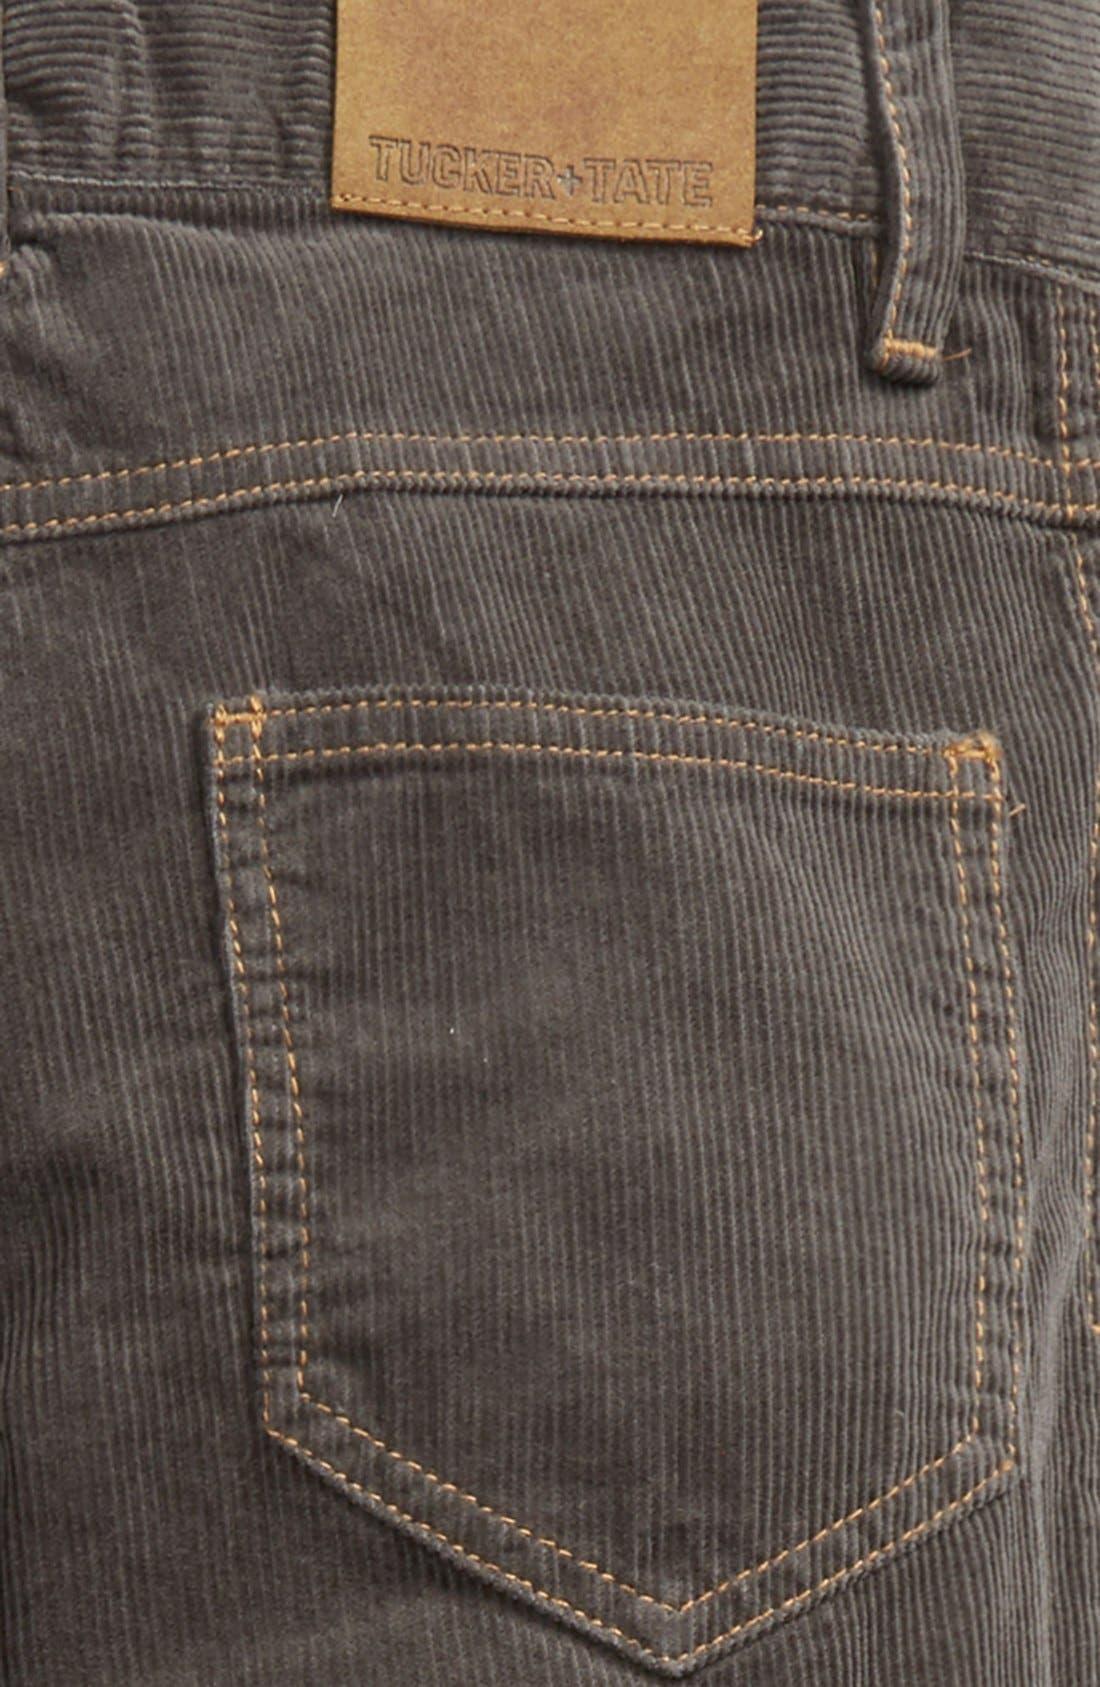 'Townsend' Corduroy Pants,                             Alternate thumbnail 24, color,